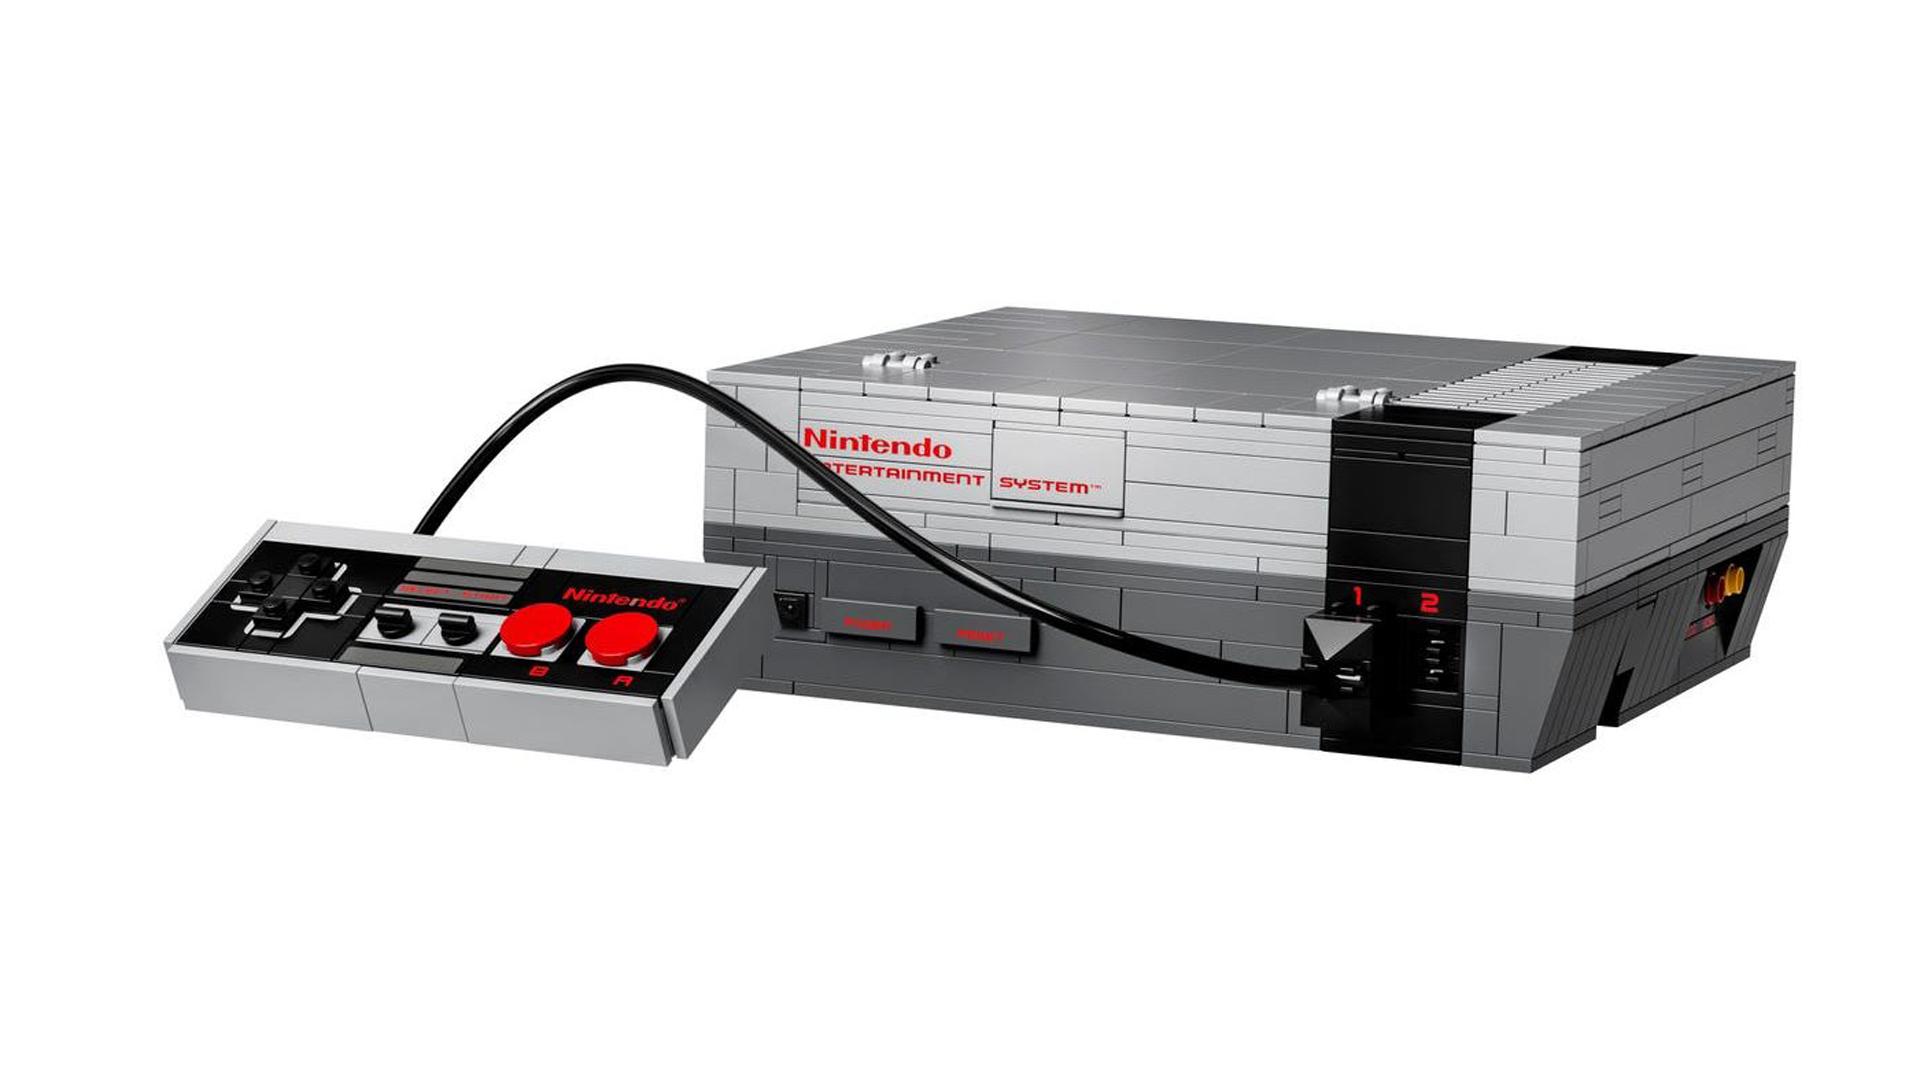 pre-order LEGO NES